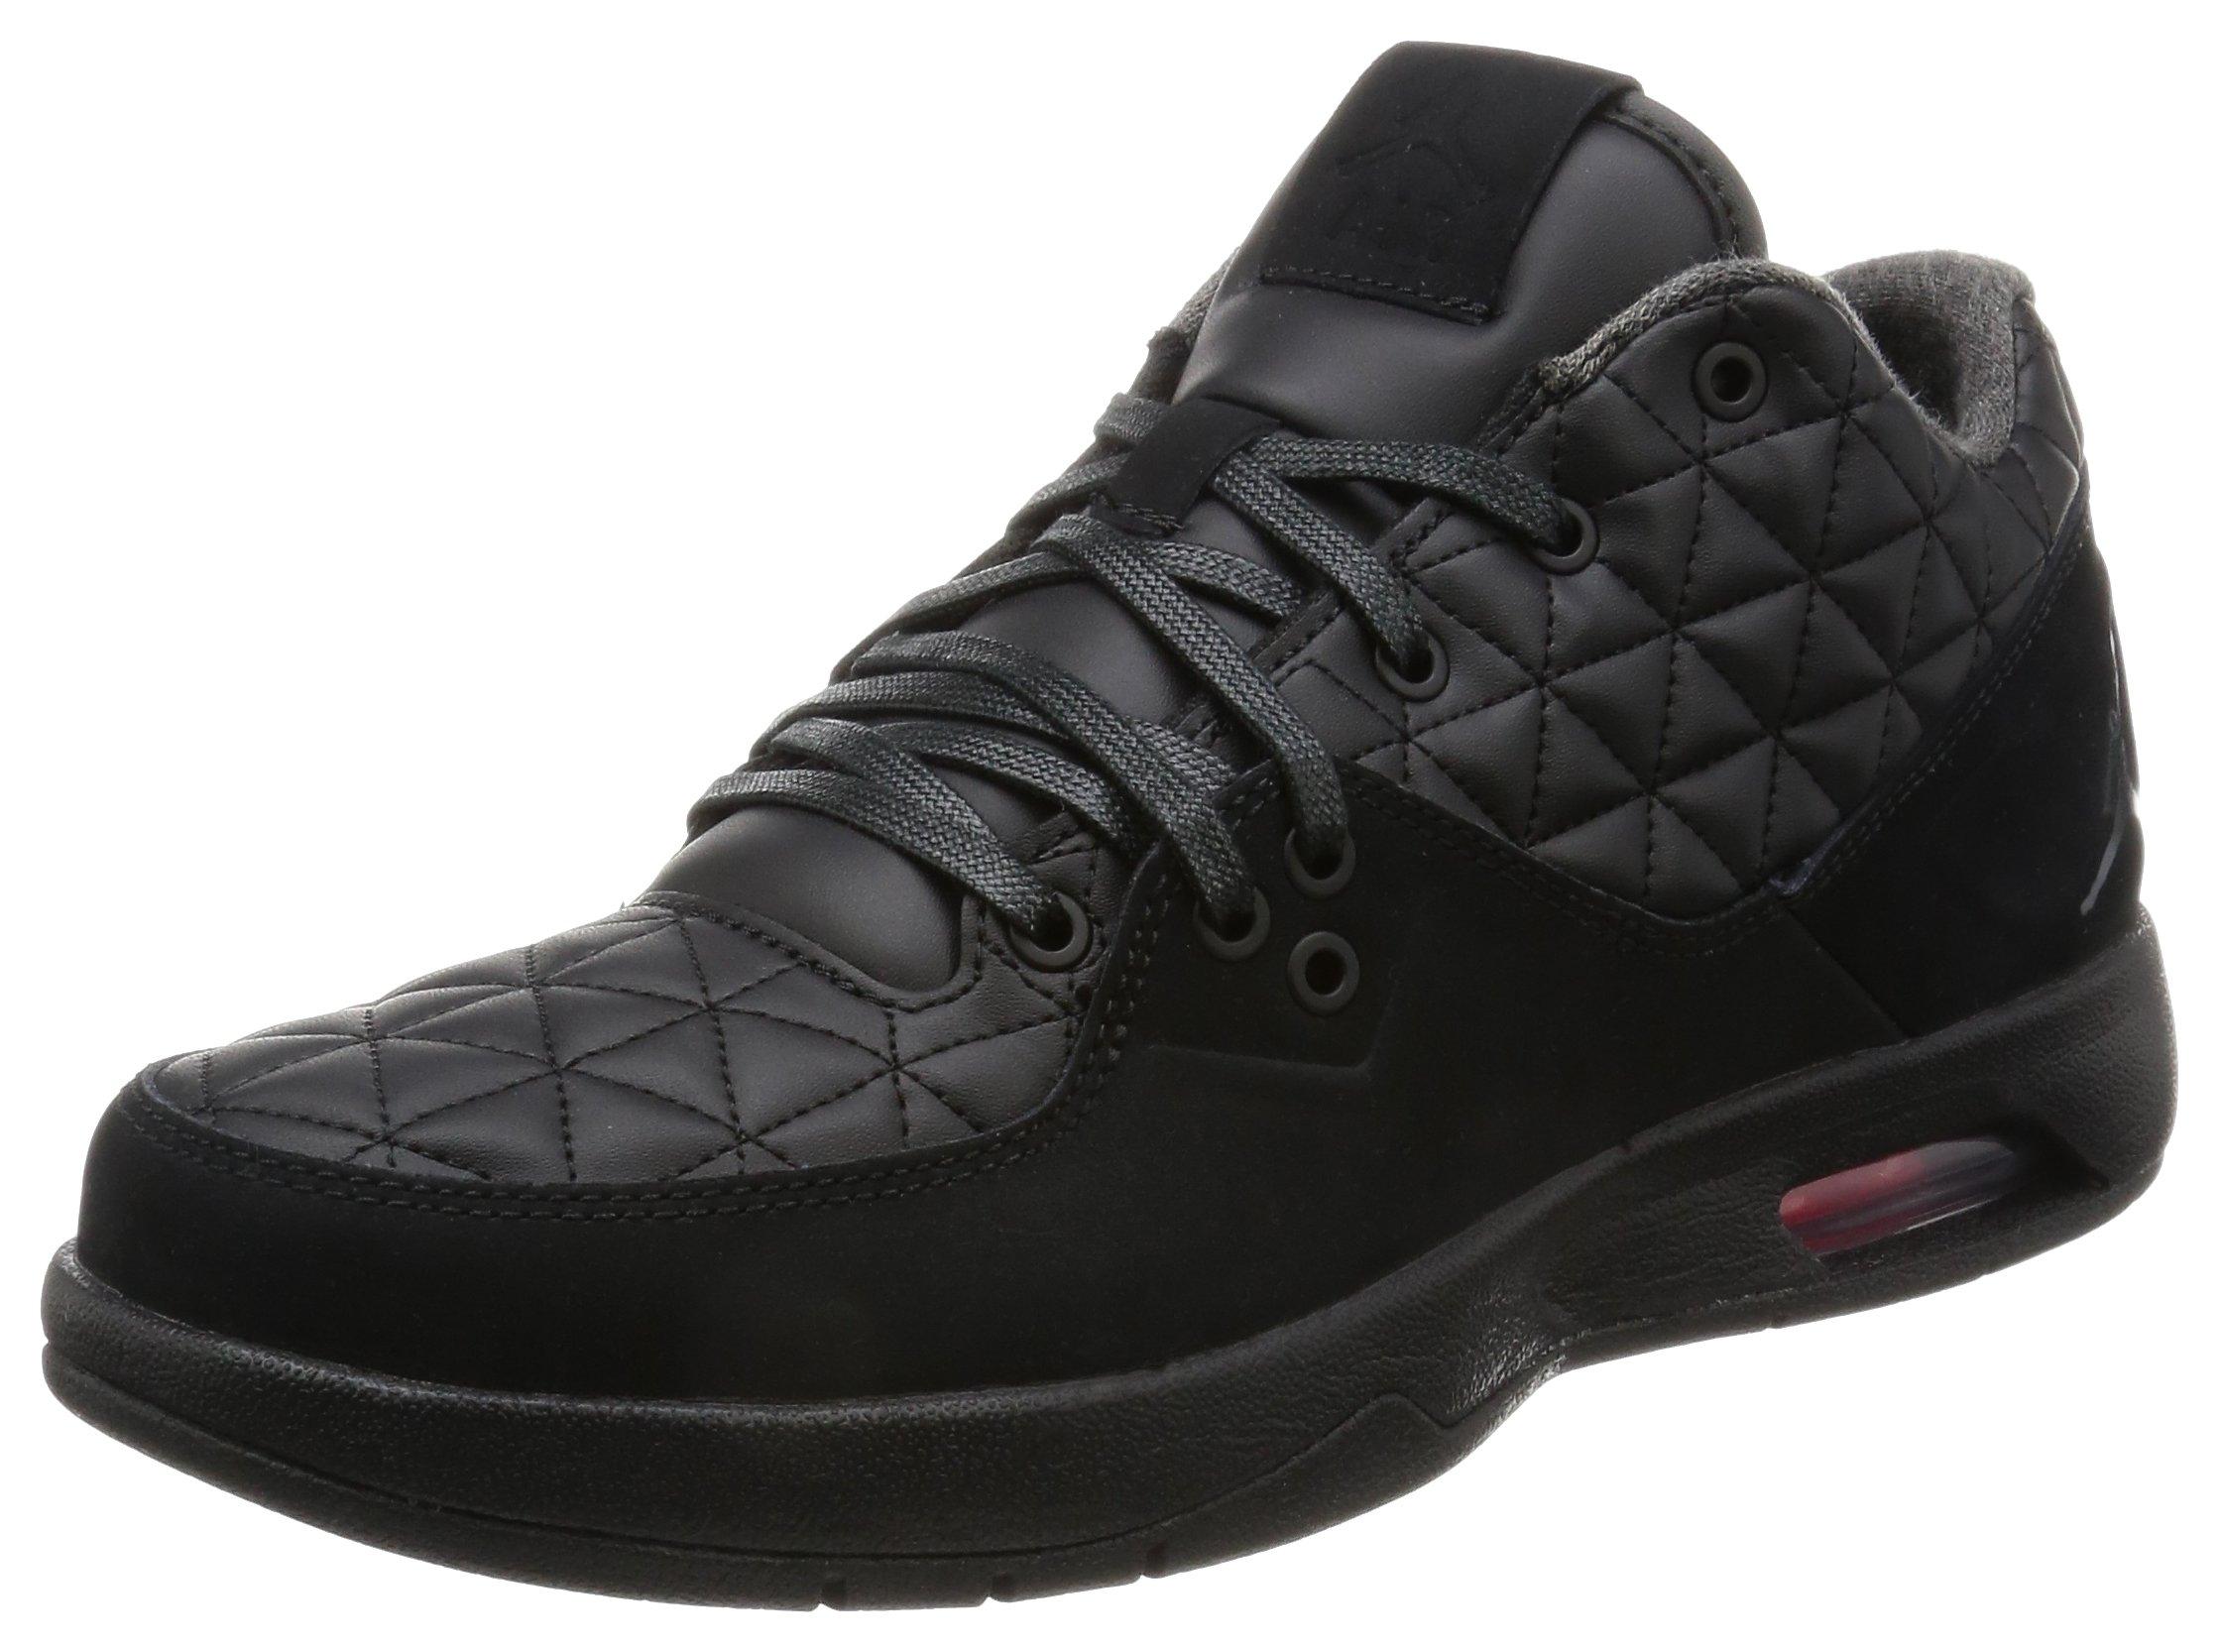 Nike Men's Jordan Clutch Basketball Shoe Black/Black-Gym Red 9